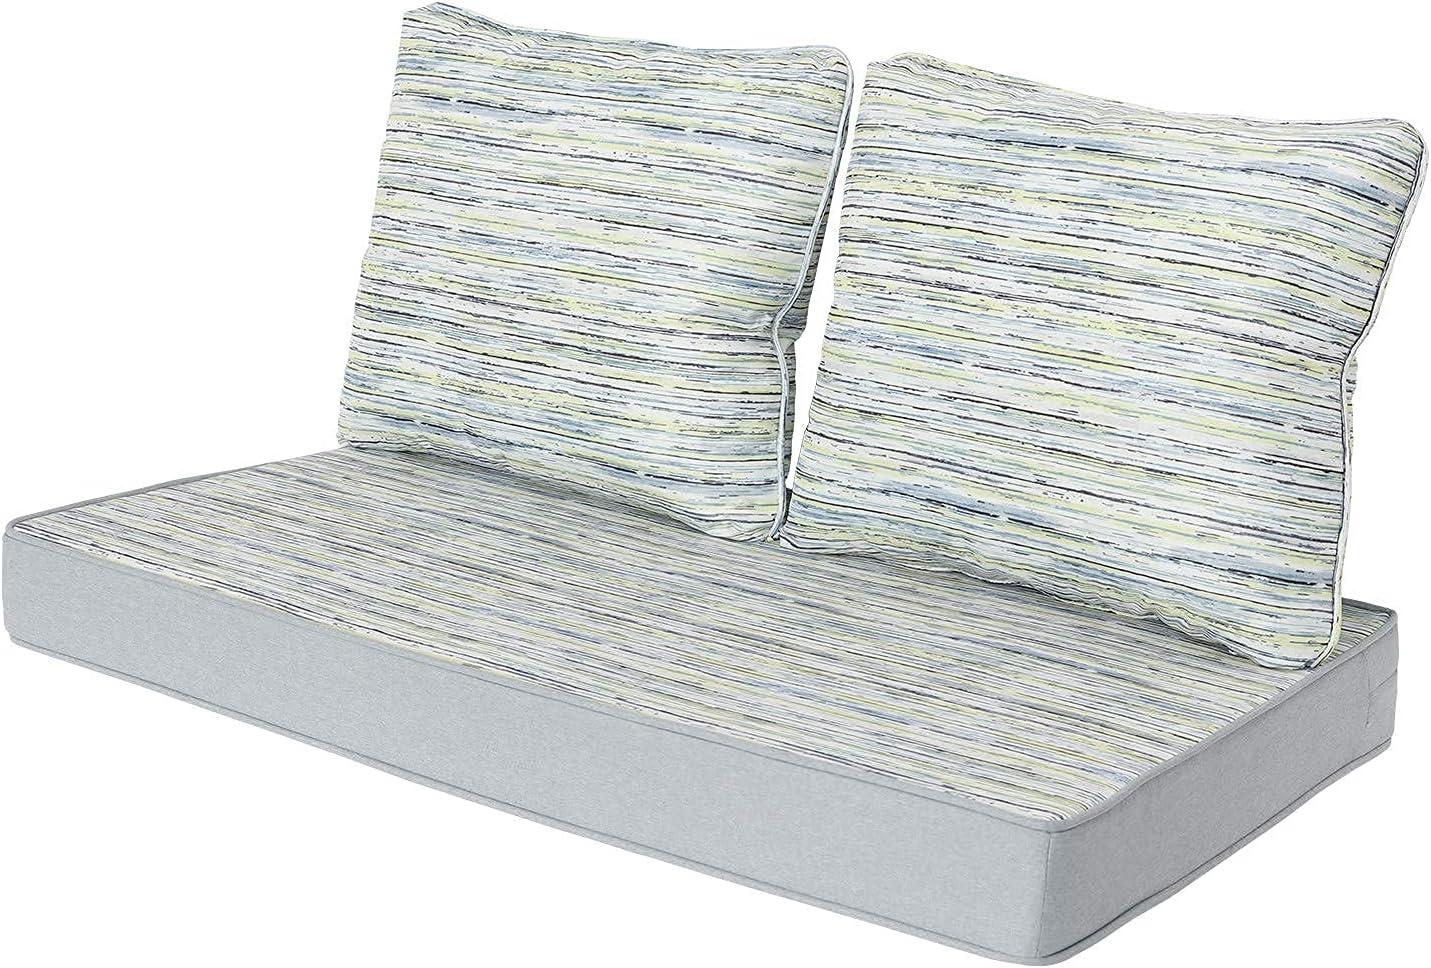 WOTU Loveseat Cushion, Indoor Outdoor Seating Cushions Patio Furniture Cushions Comofort Deep Seat